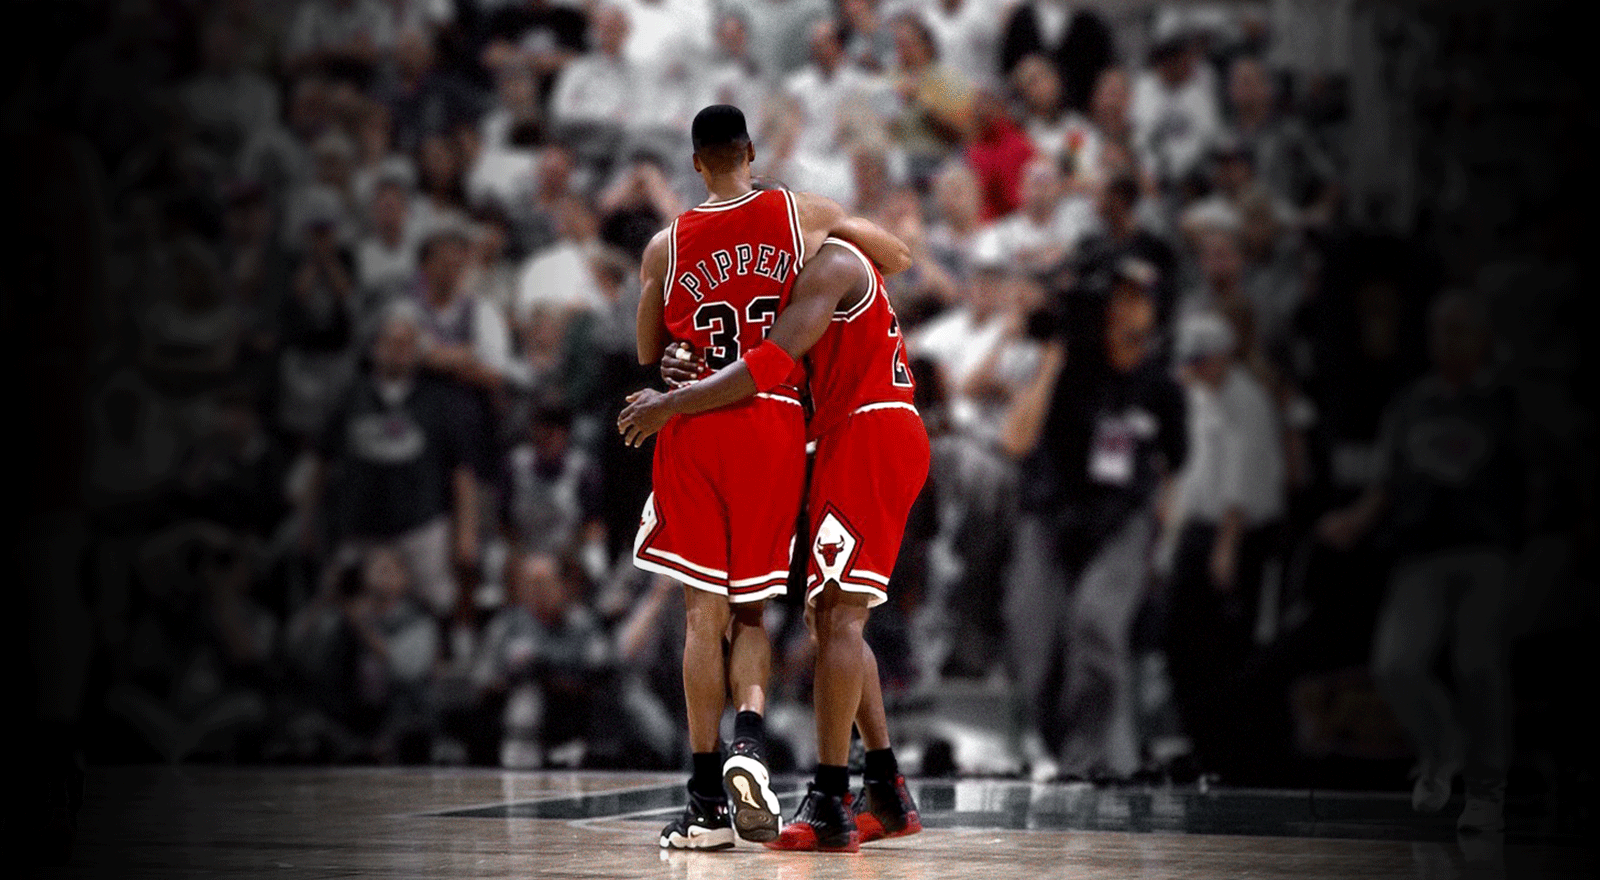 Basketball Quotes: 5 Quotes On Tenacity & Basketball